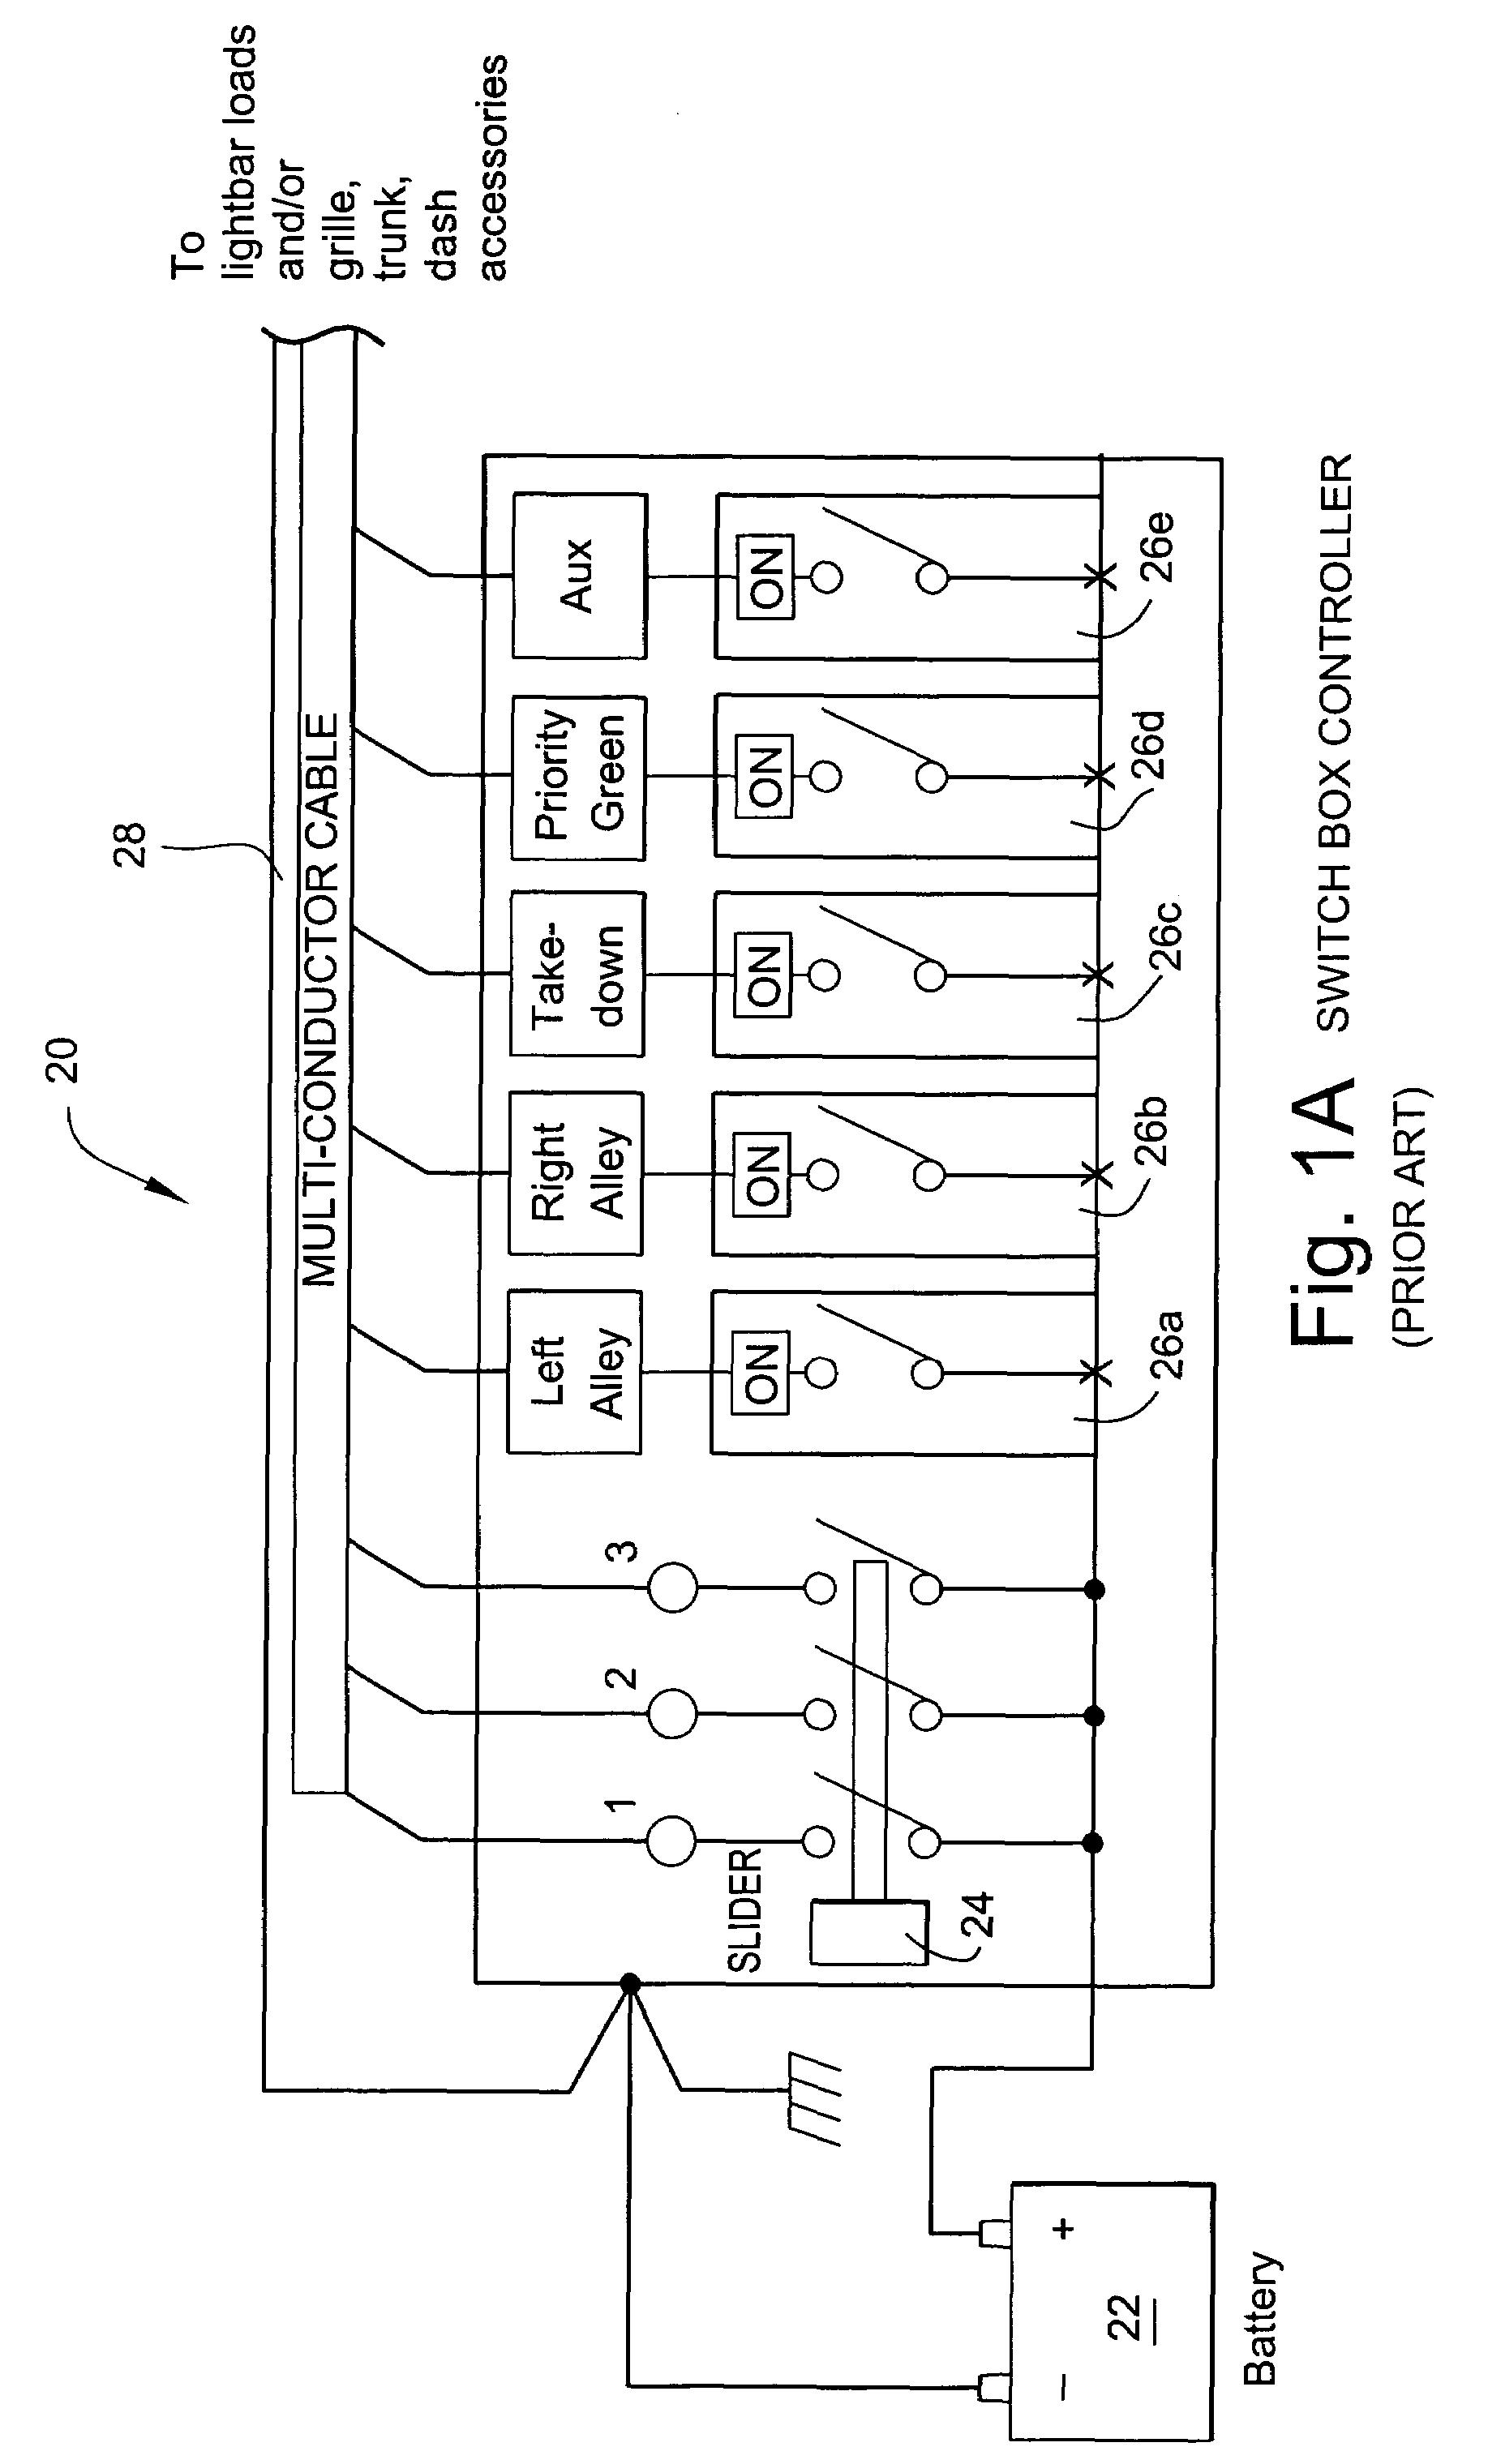 Wii Sensor Bar Wiring Diagram